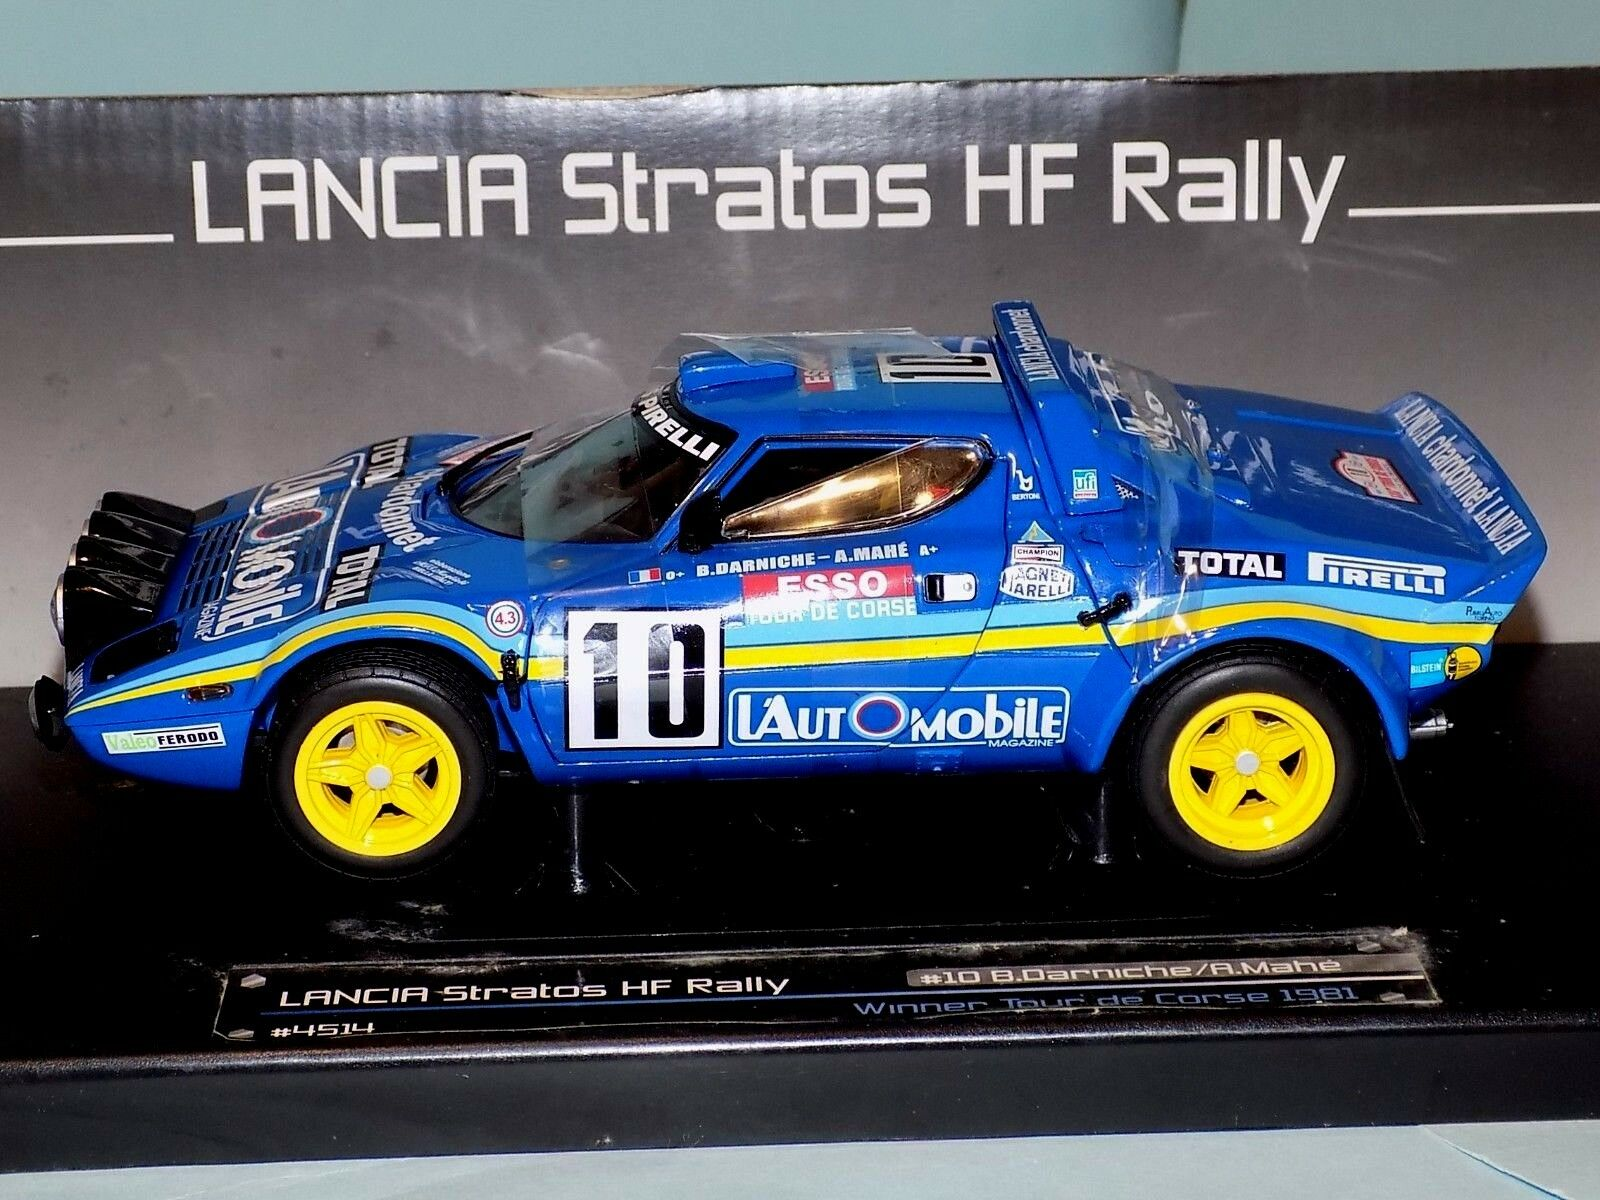 Lancia Stratos HF Rally B.Darniche st Tour de Corse SUN STAR 4514 1 18